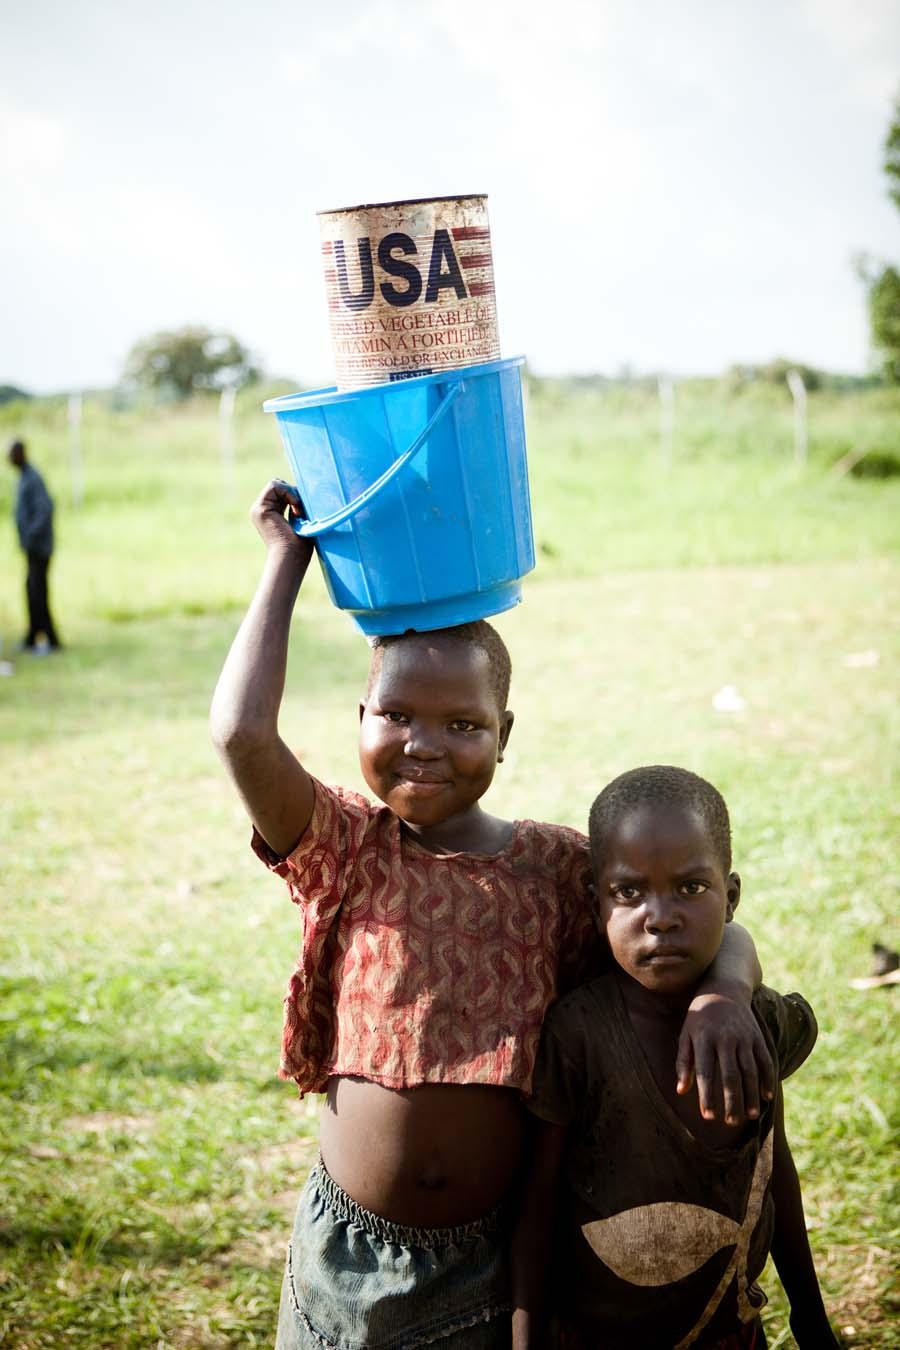 jessicadavisphotography.com | Jessica Davis Photography | Portrait Work in Uganda| Travel Photographer | World Event Photographs 9 (1).jpg